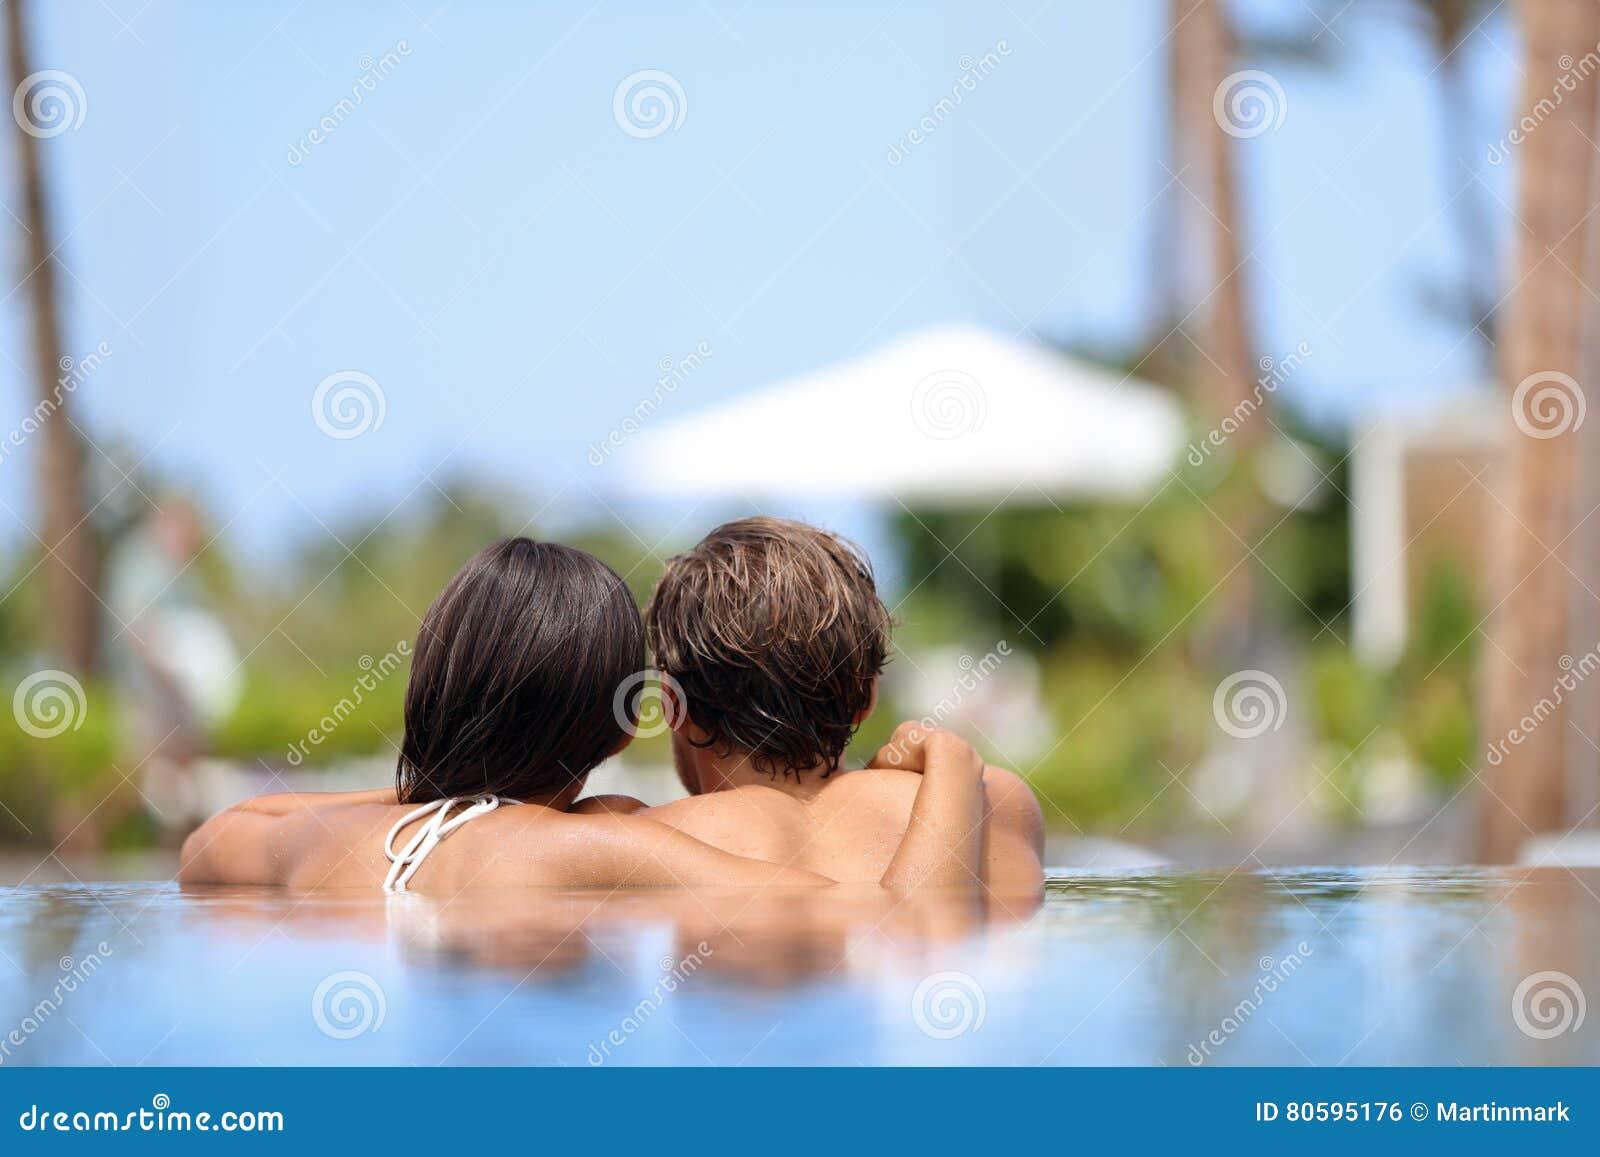 Honeymoon couple relaxing together - swimming pool